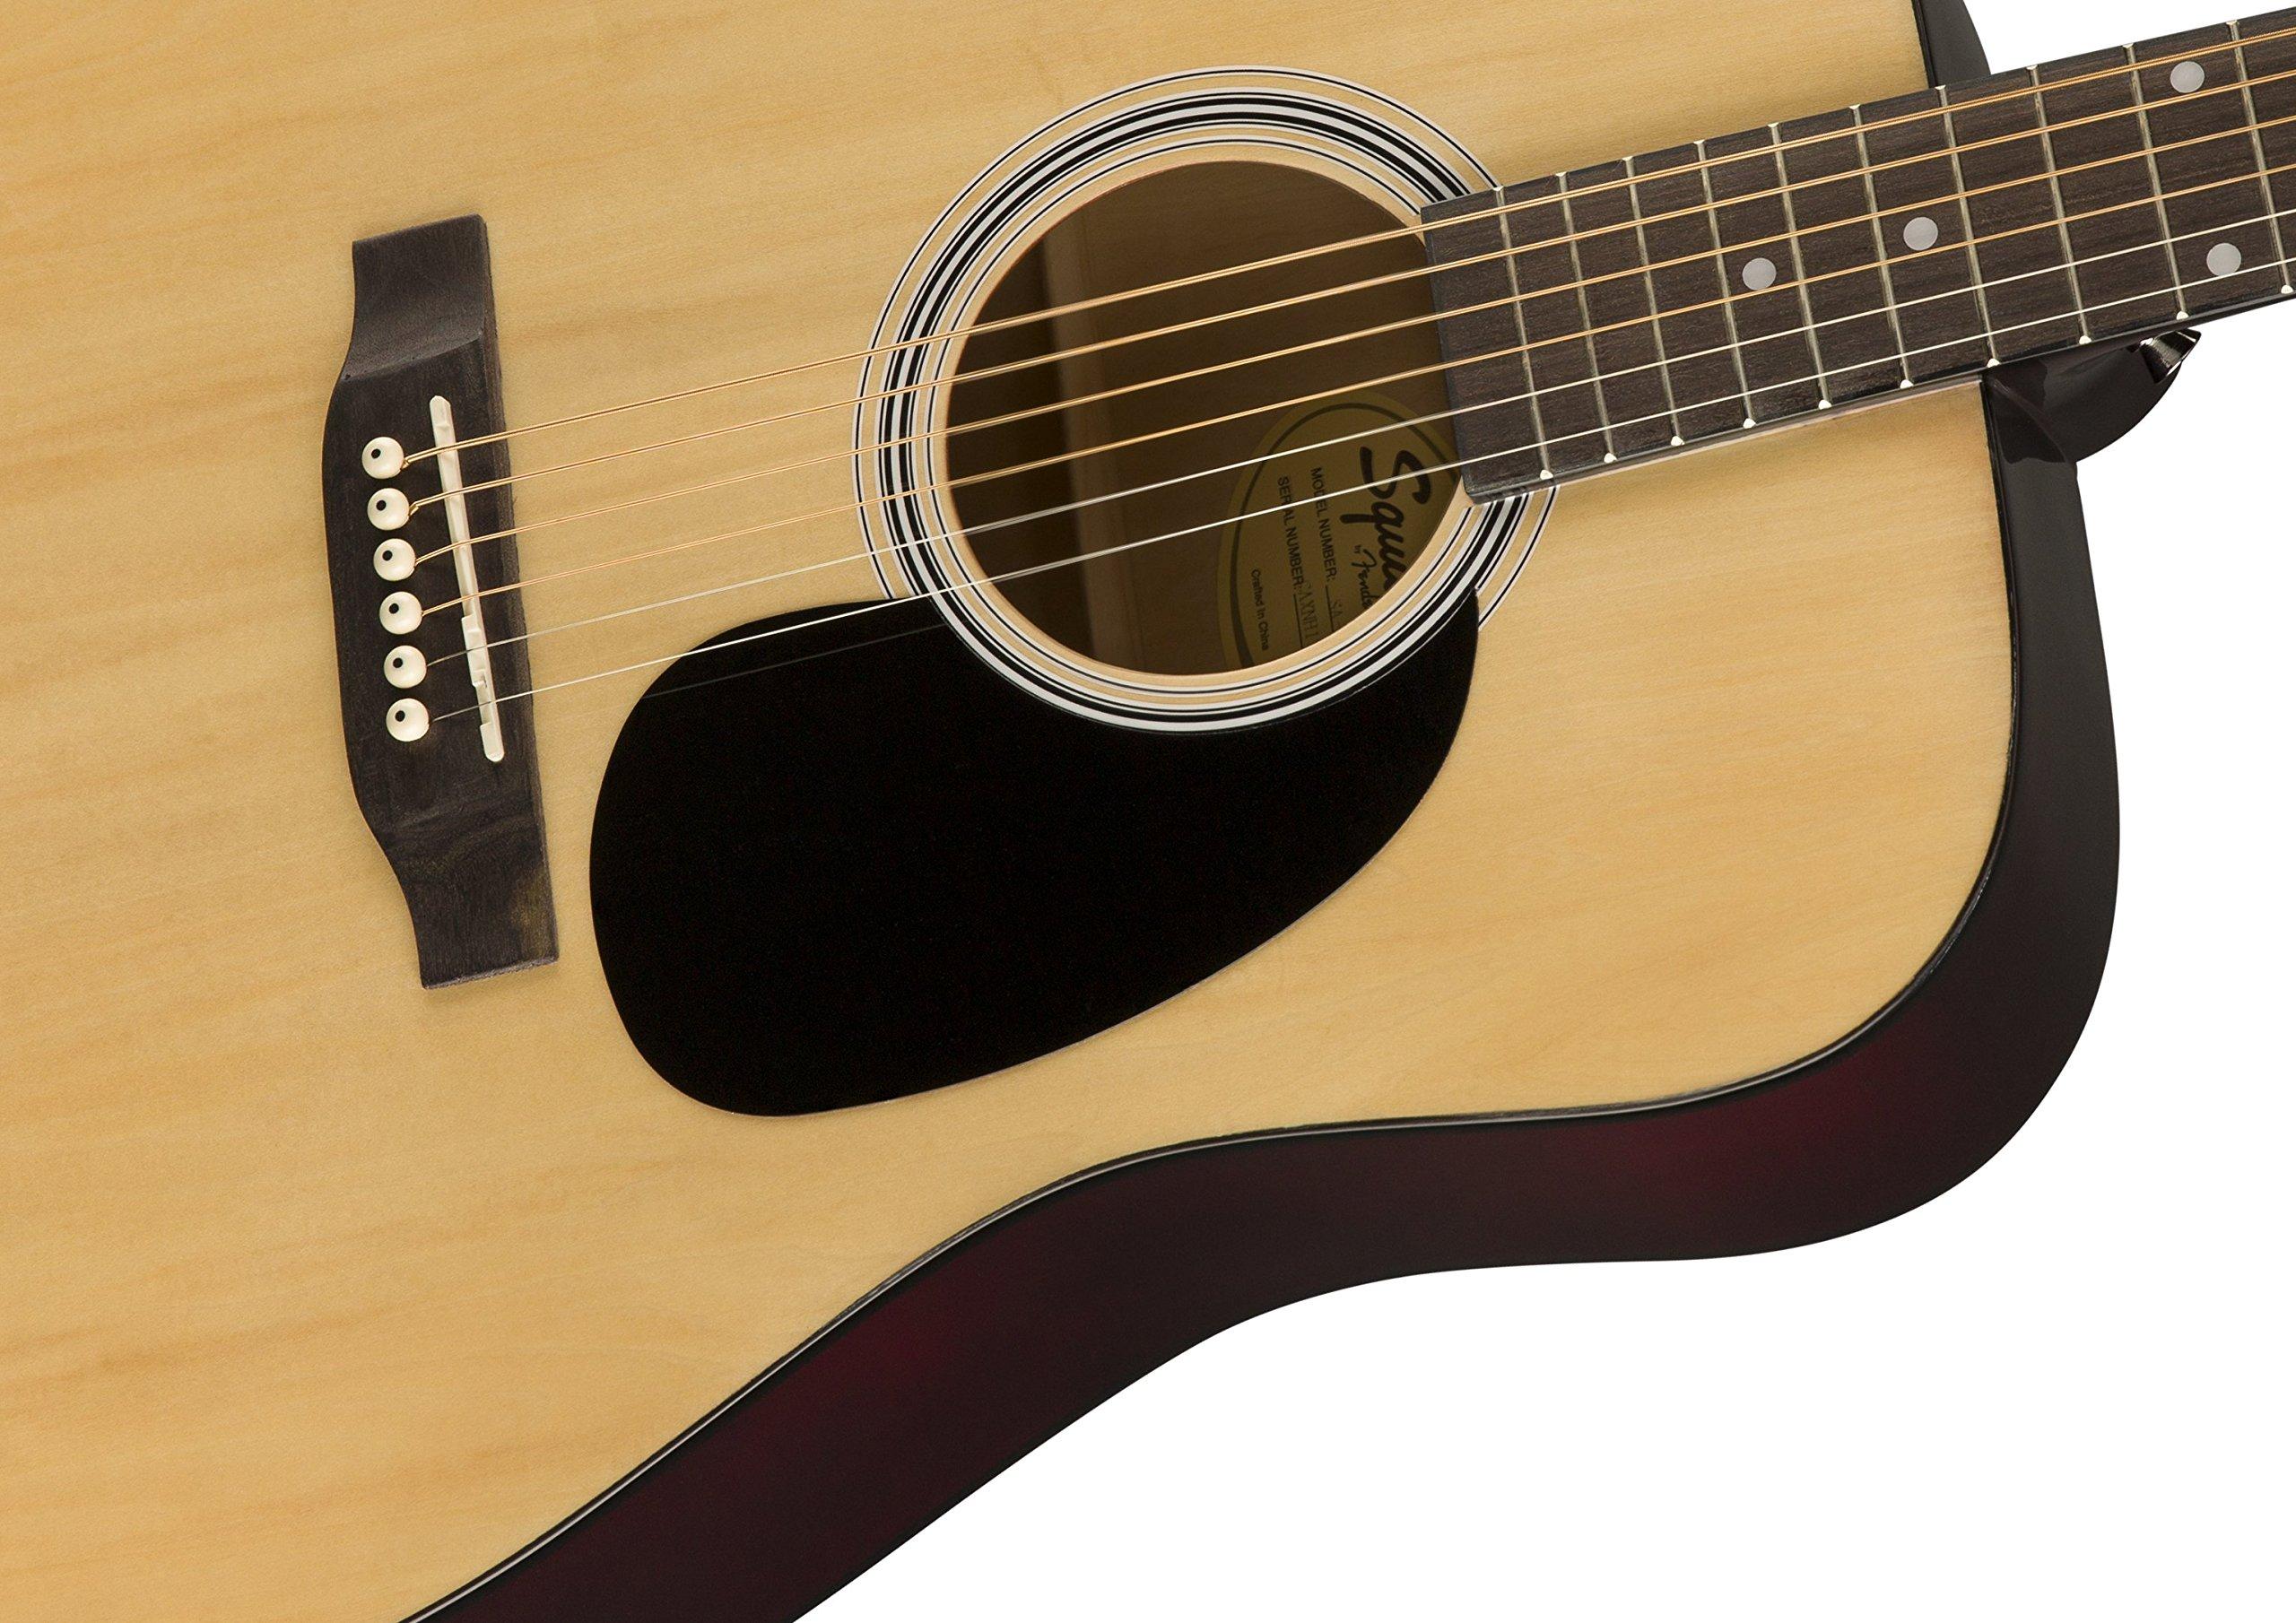 Squier de Fender SA-150 principiante Dreadnought Guitarra Acústica ...